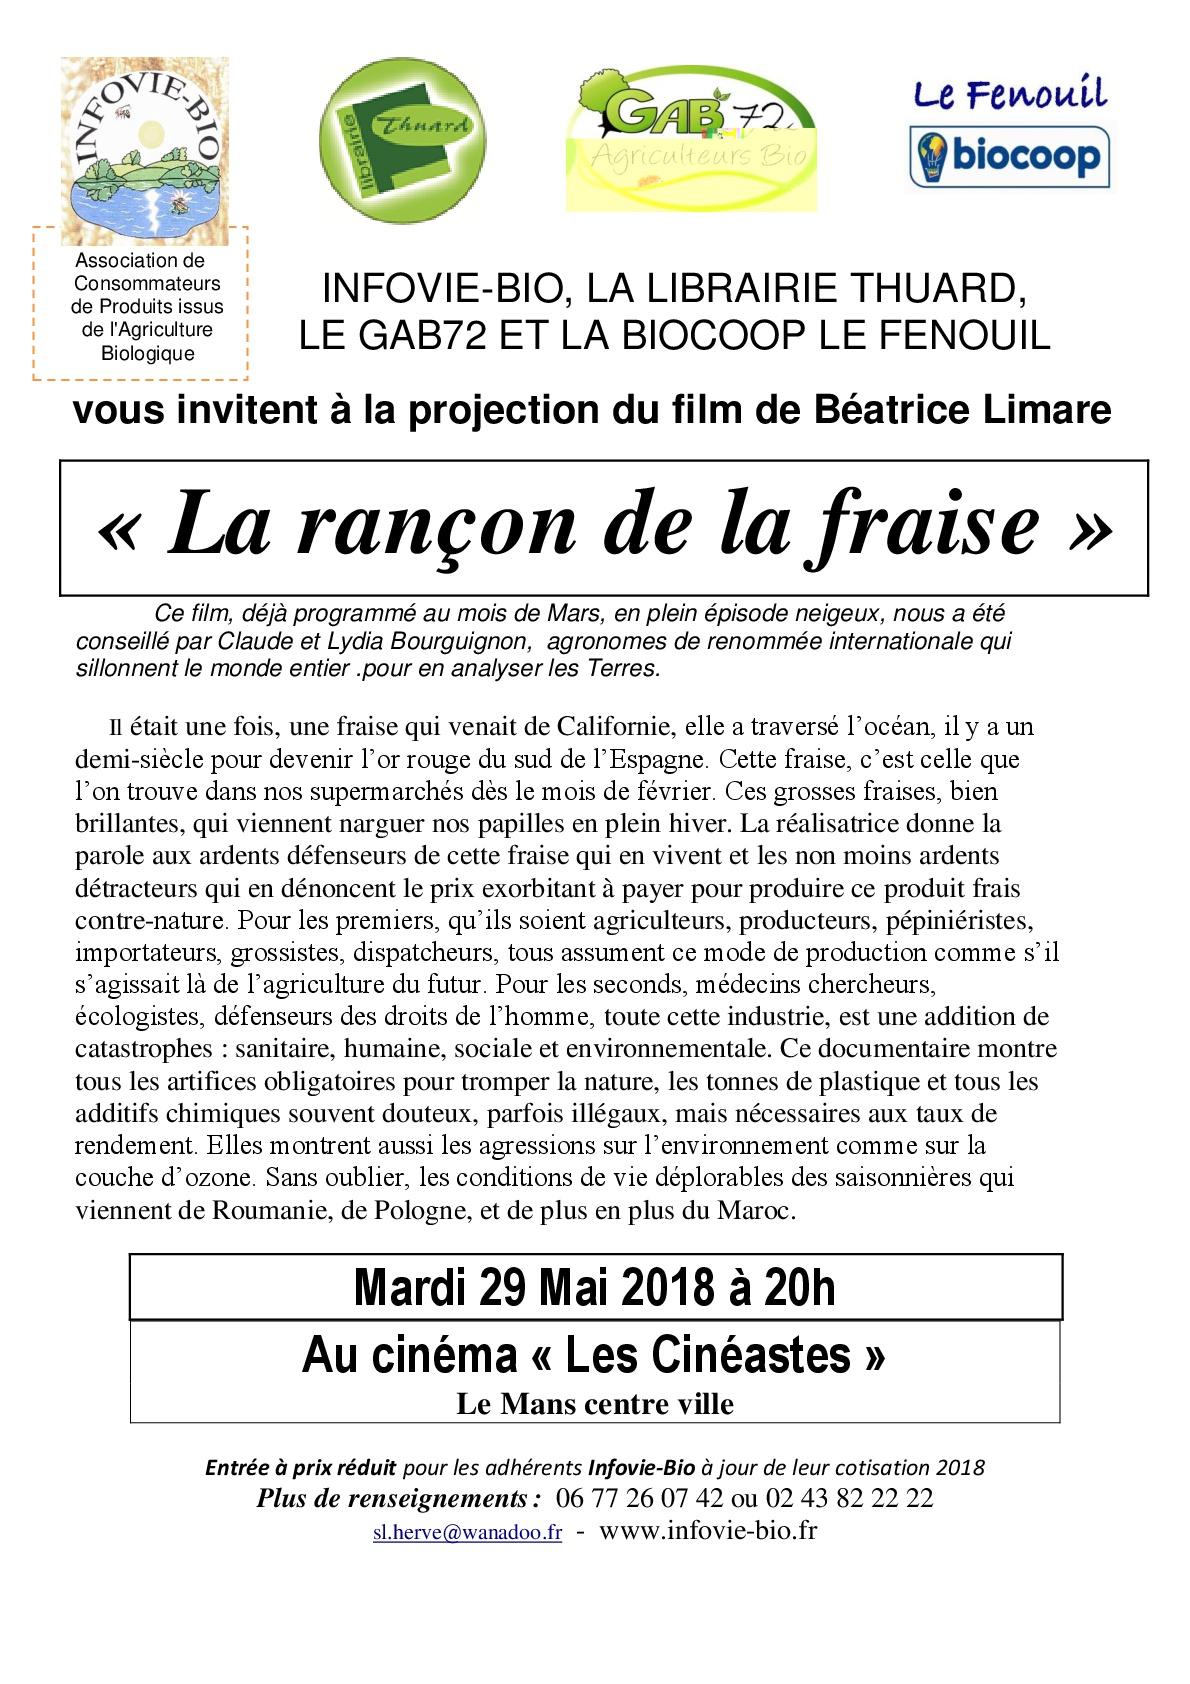 affiche_v2_film_la_rancon_de_la_fraise_pdf_-001.jpg